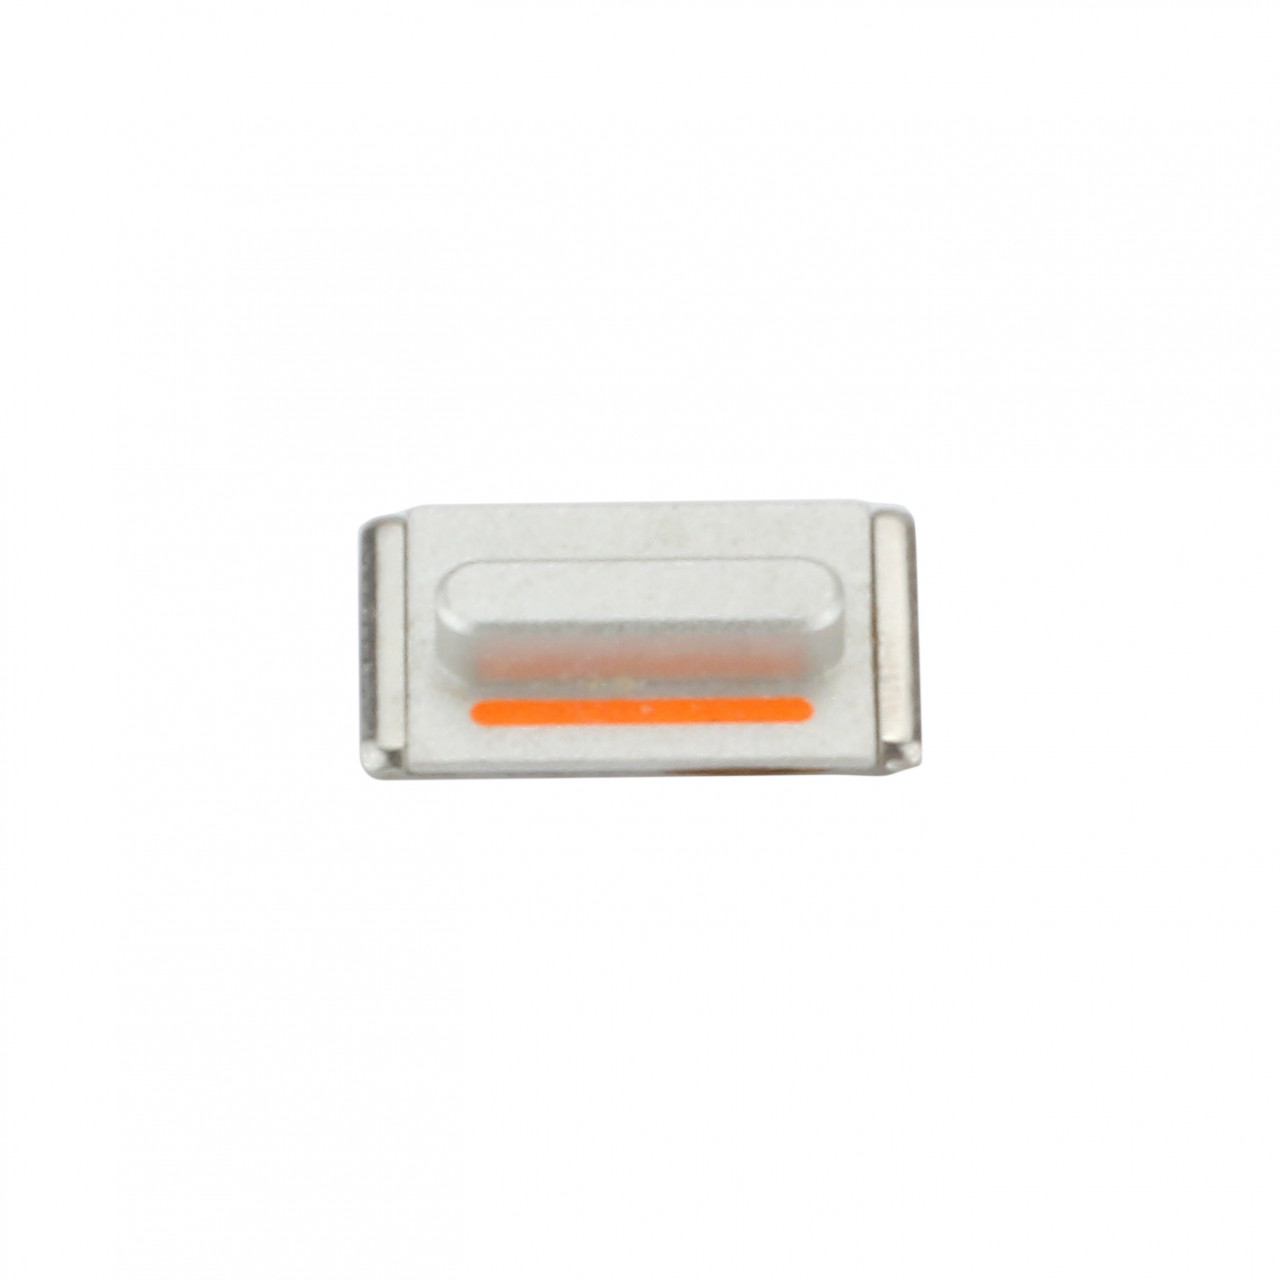 Apple Stumm- / Lautlostaste, passend für iPhone 5